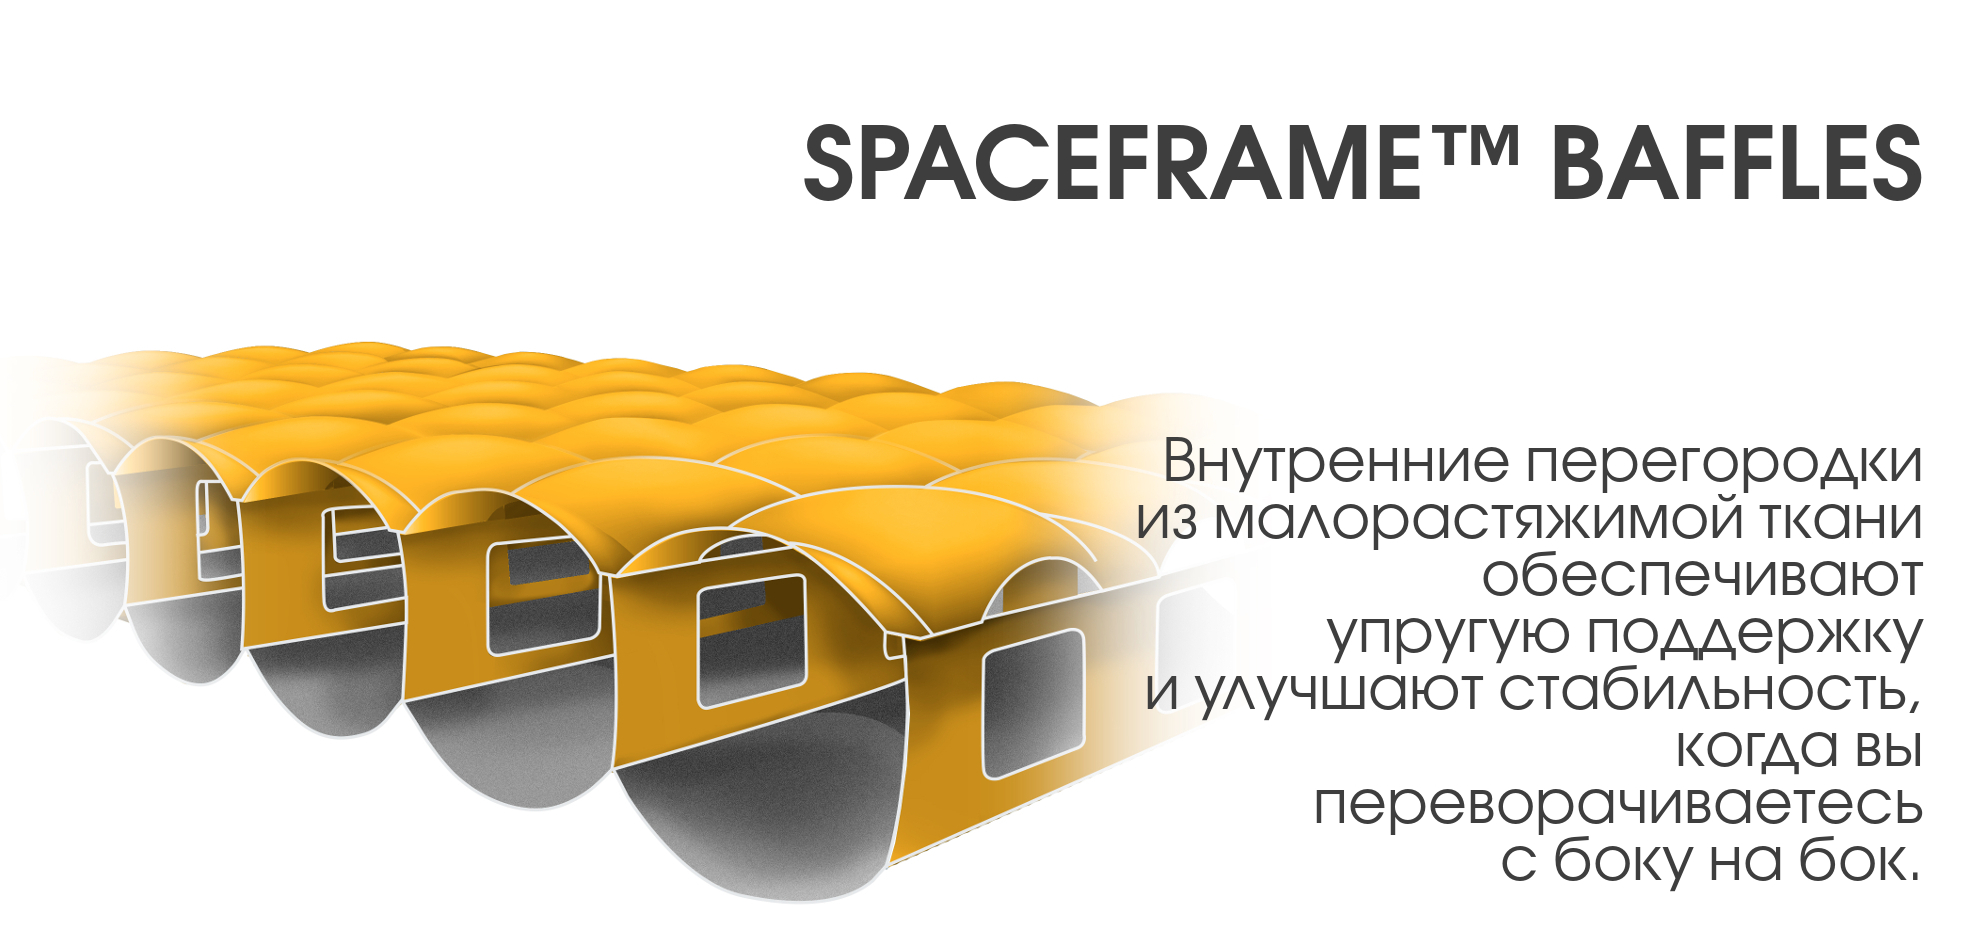 Внутренний каркас жесткости NEMO Spaceframe Baffle